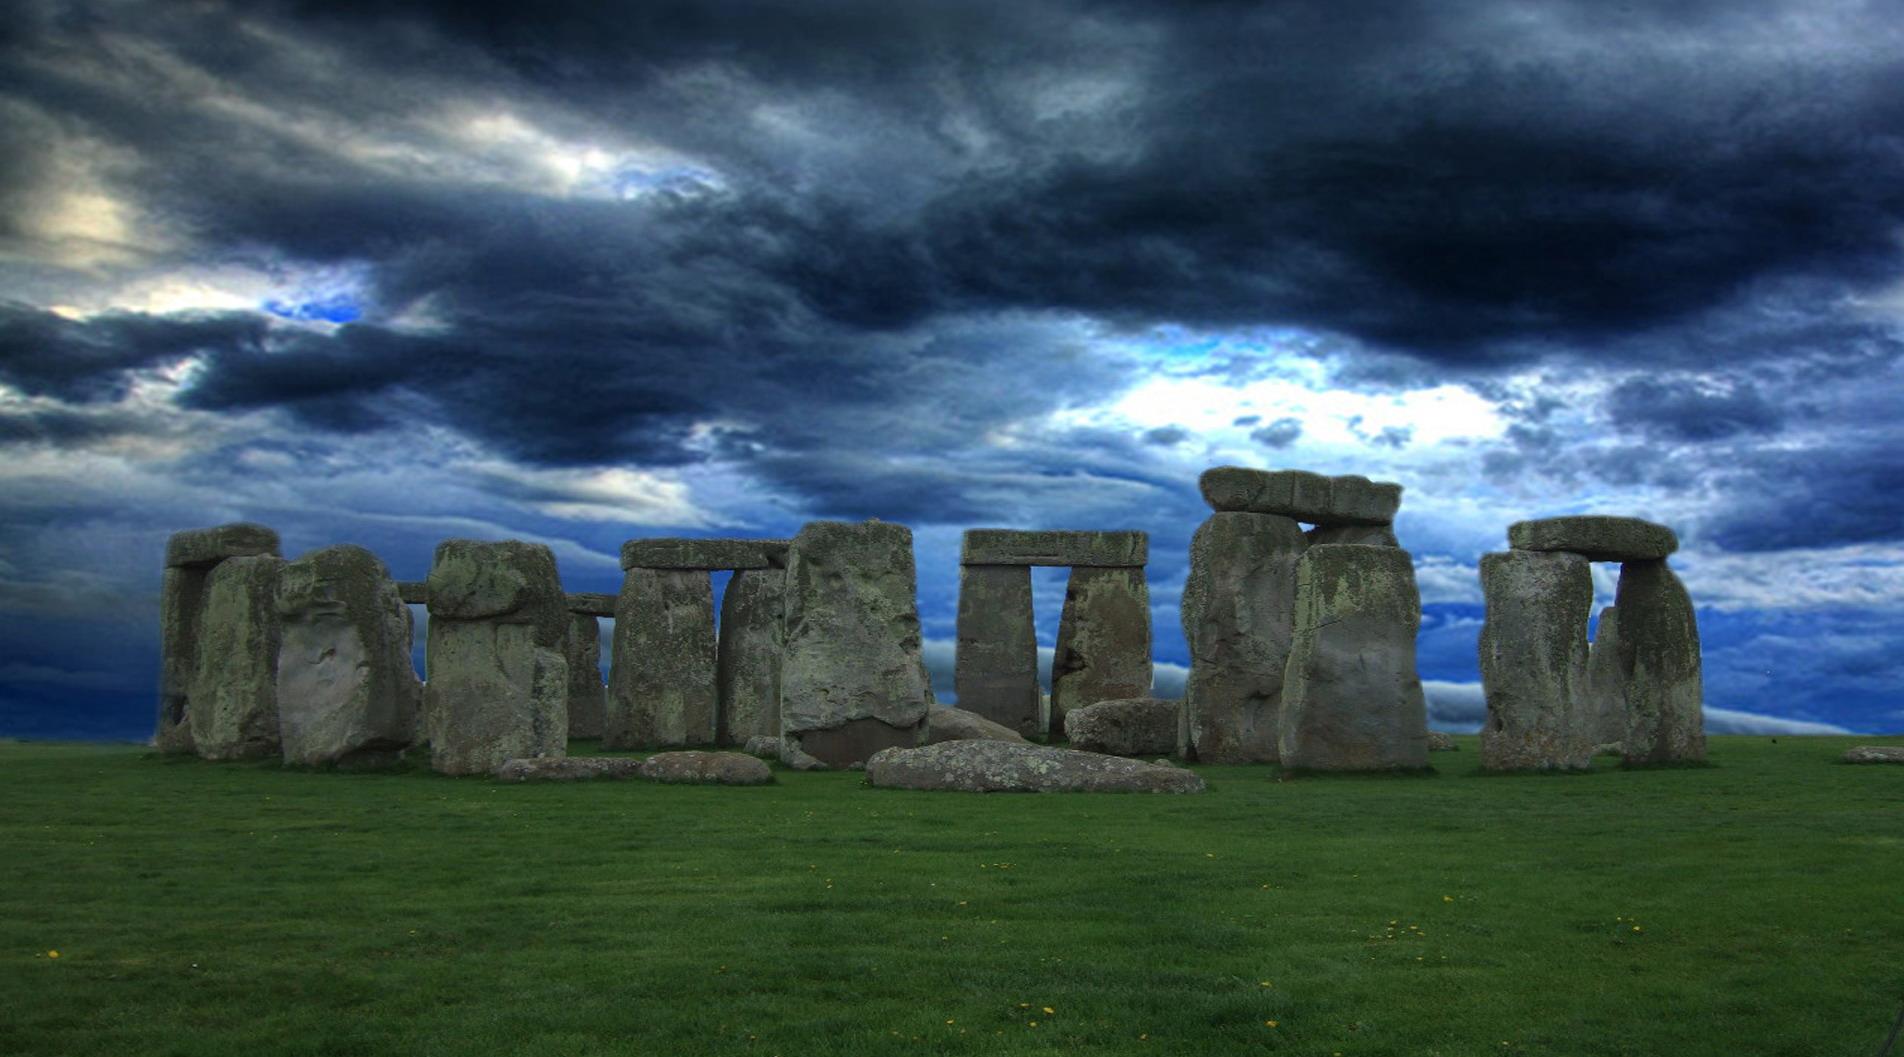 Stonehengejpeg